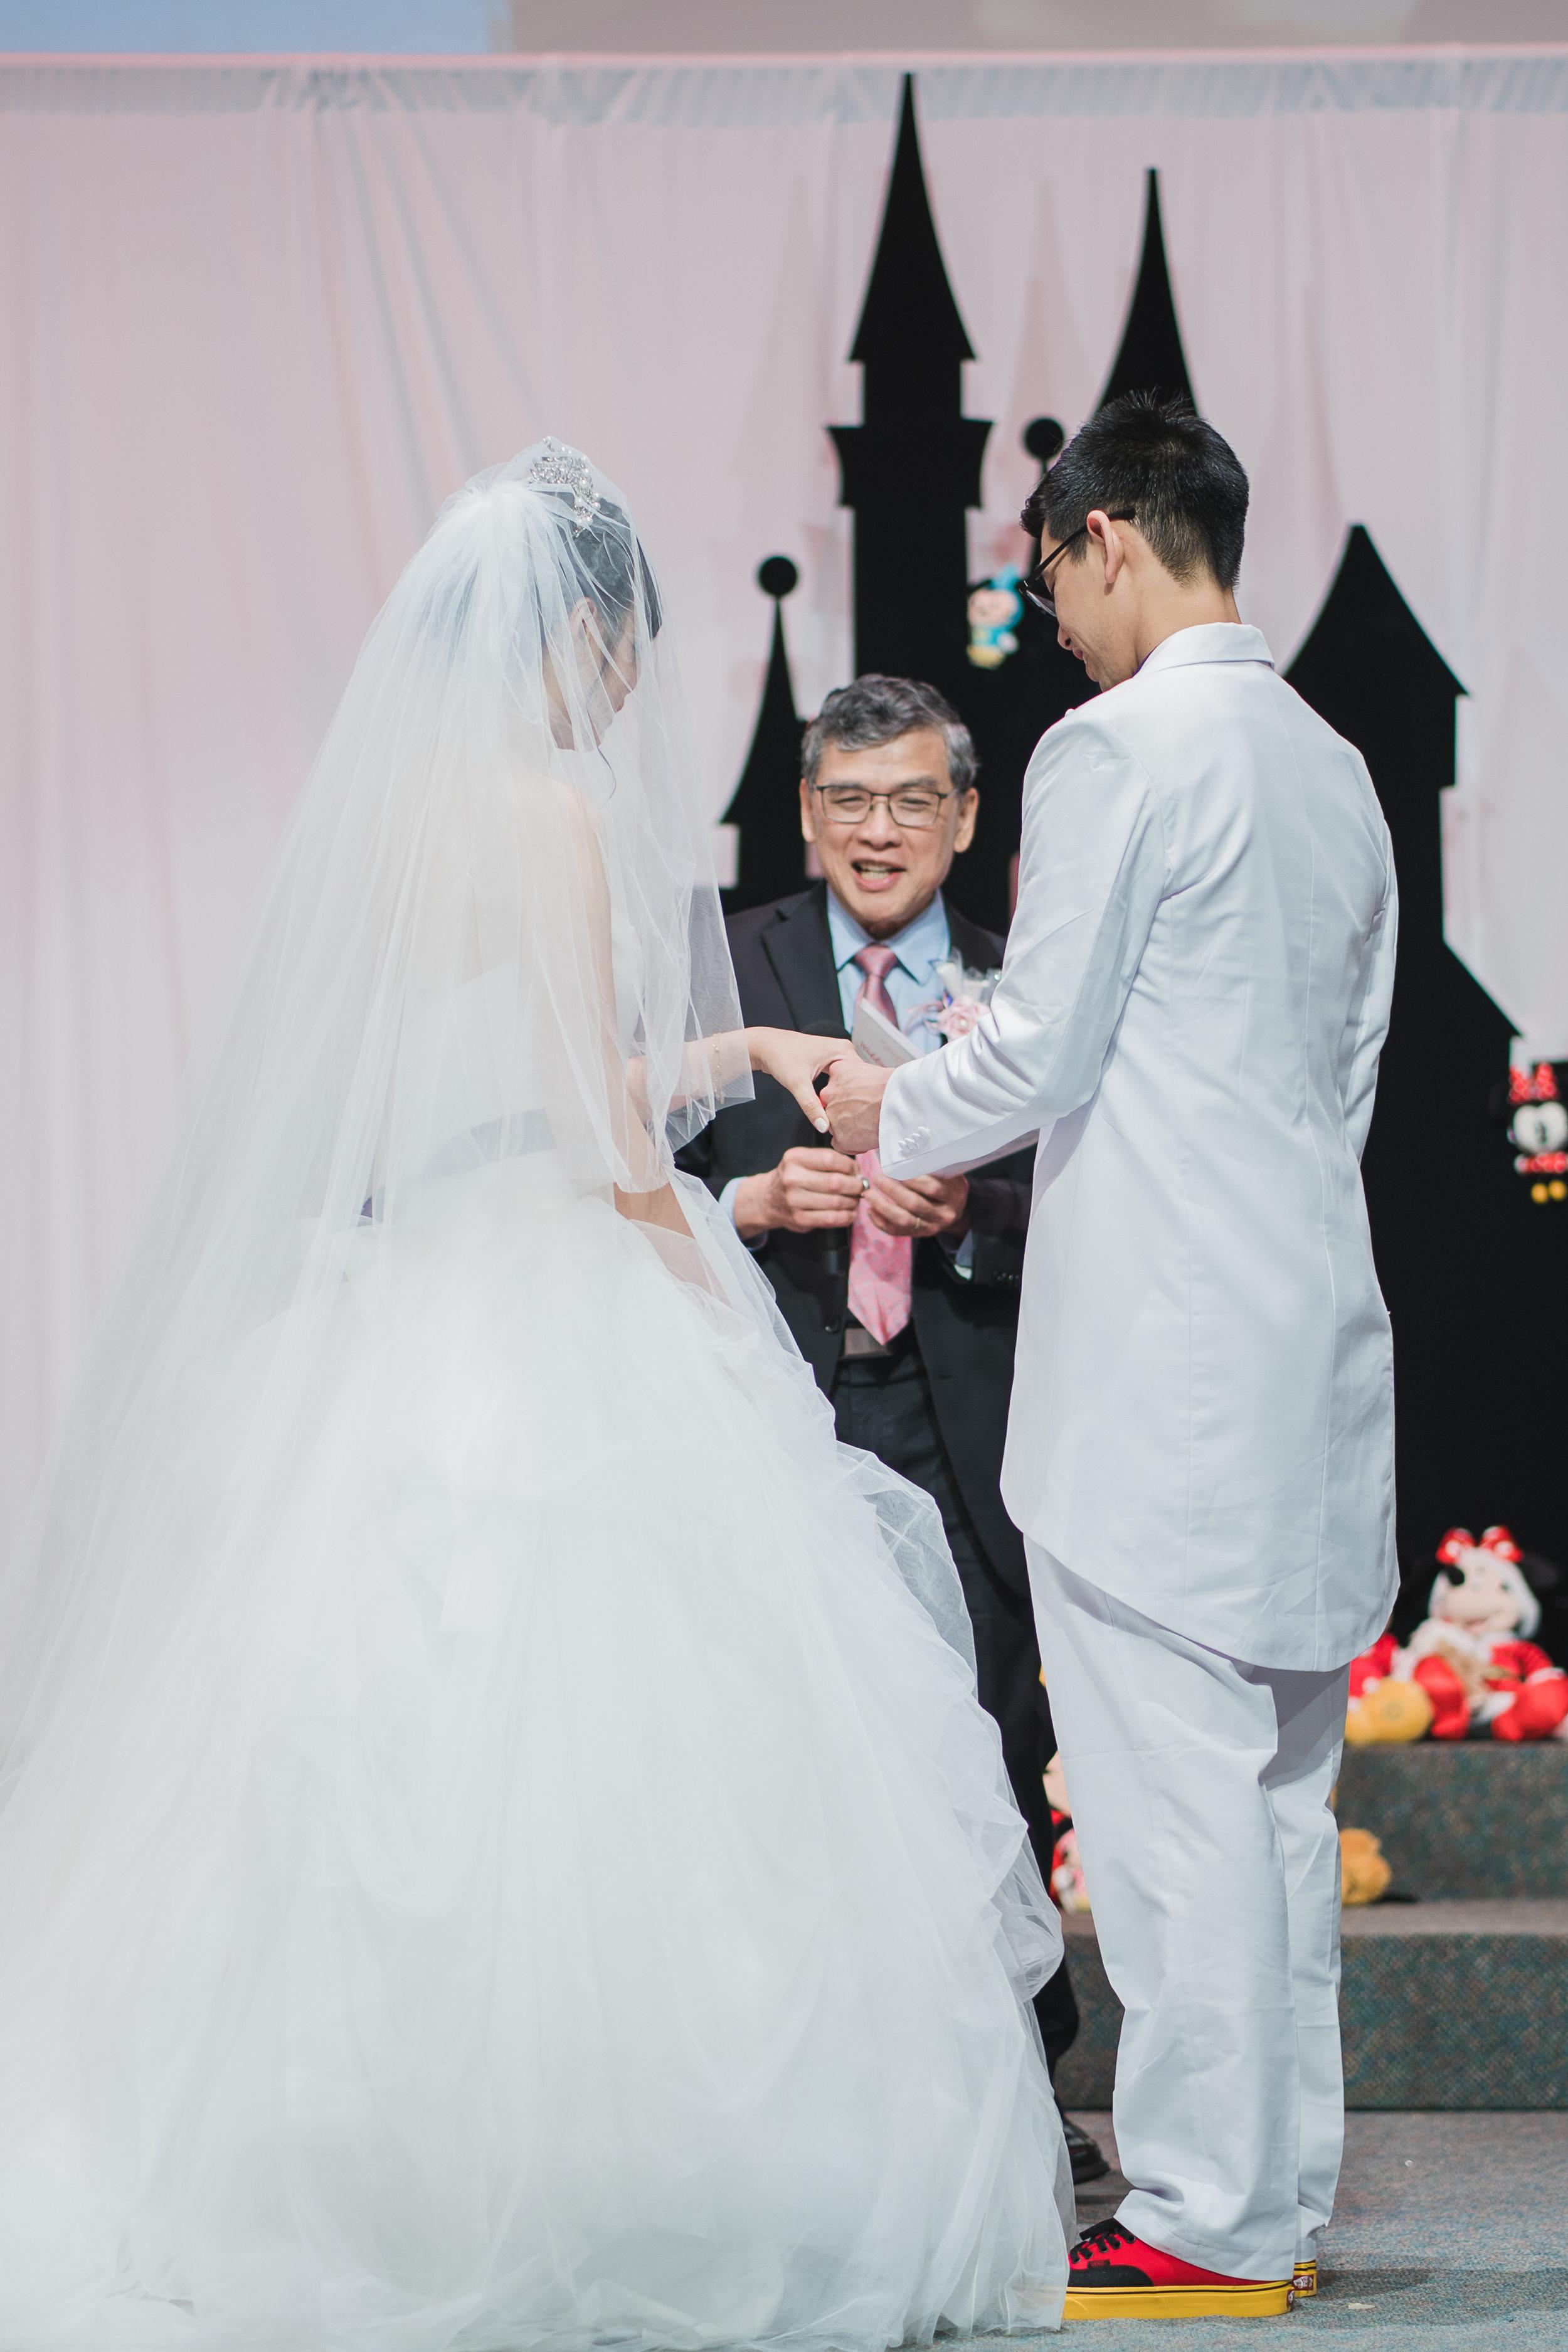 20190520 - Pamela & Matthew Wedding - 0149.jpg